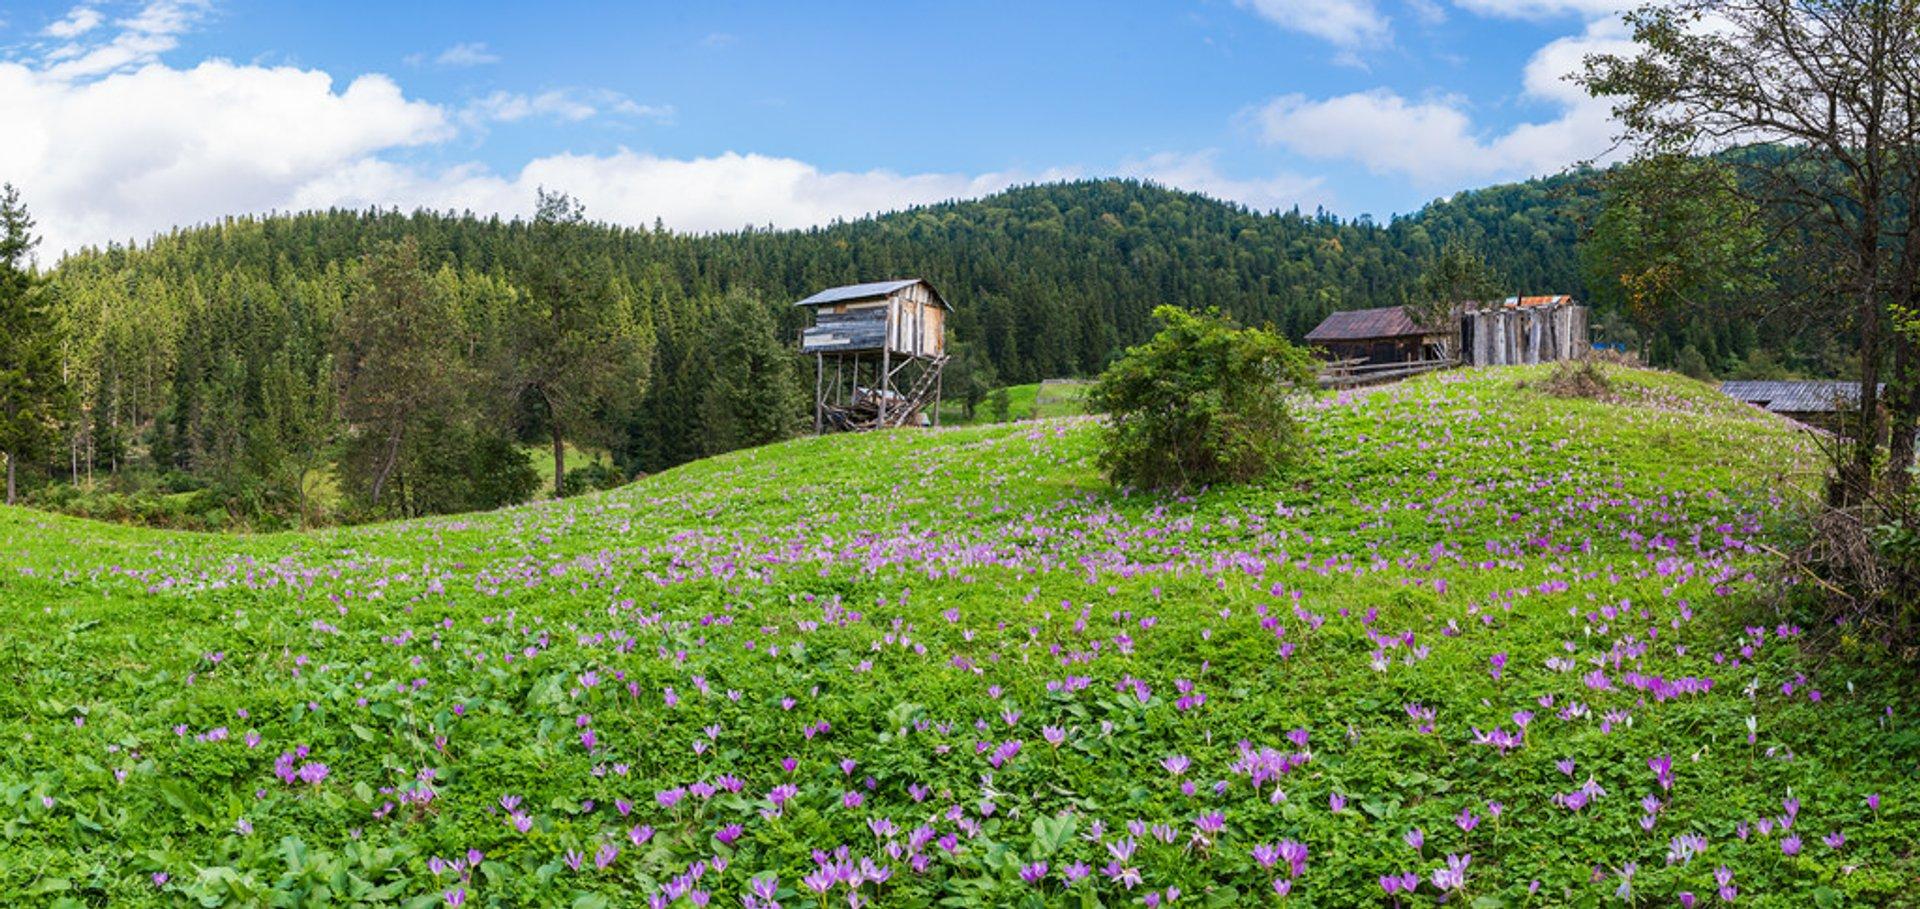 Wildflower field in Kalınçam, Tonya, Trabzon, Turkey 2020